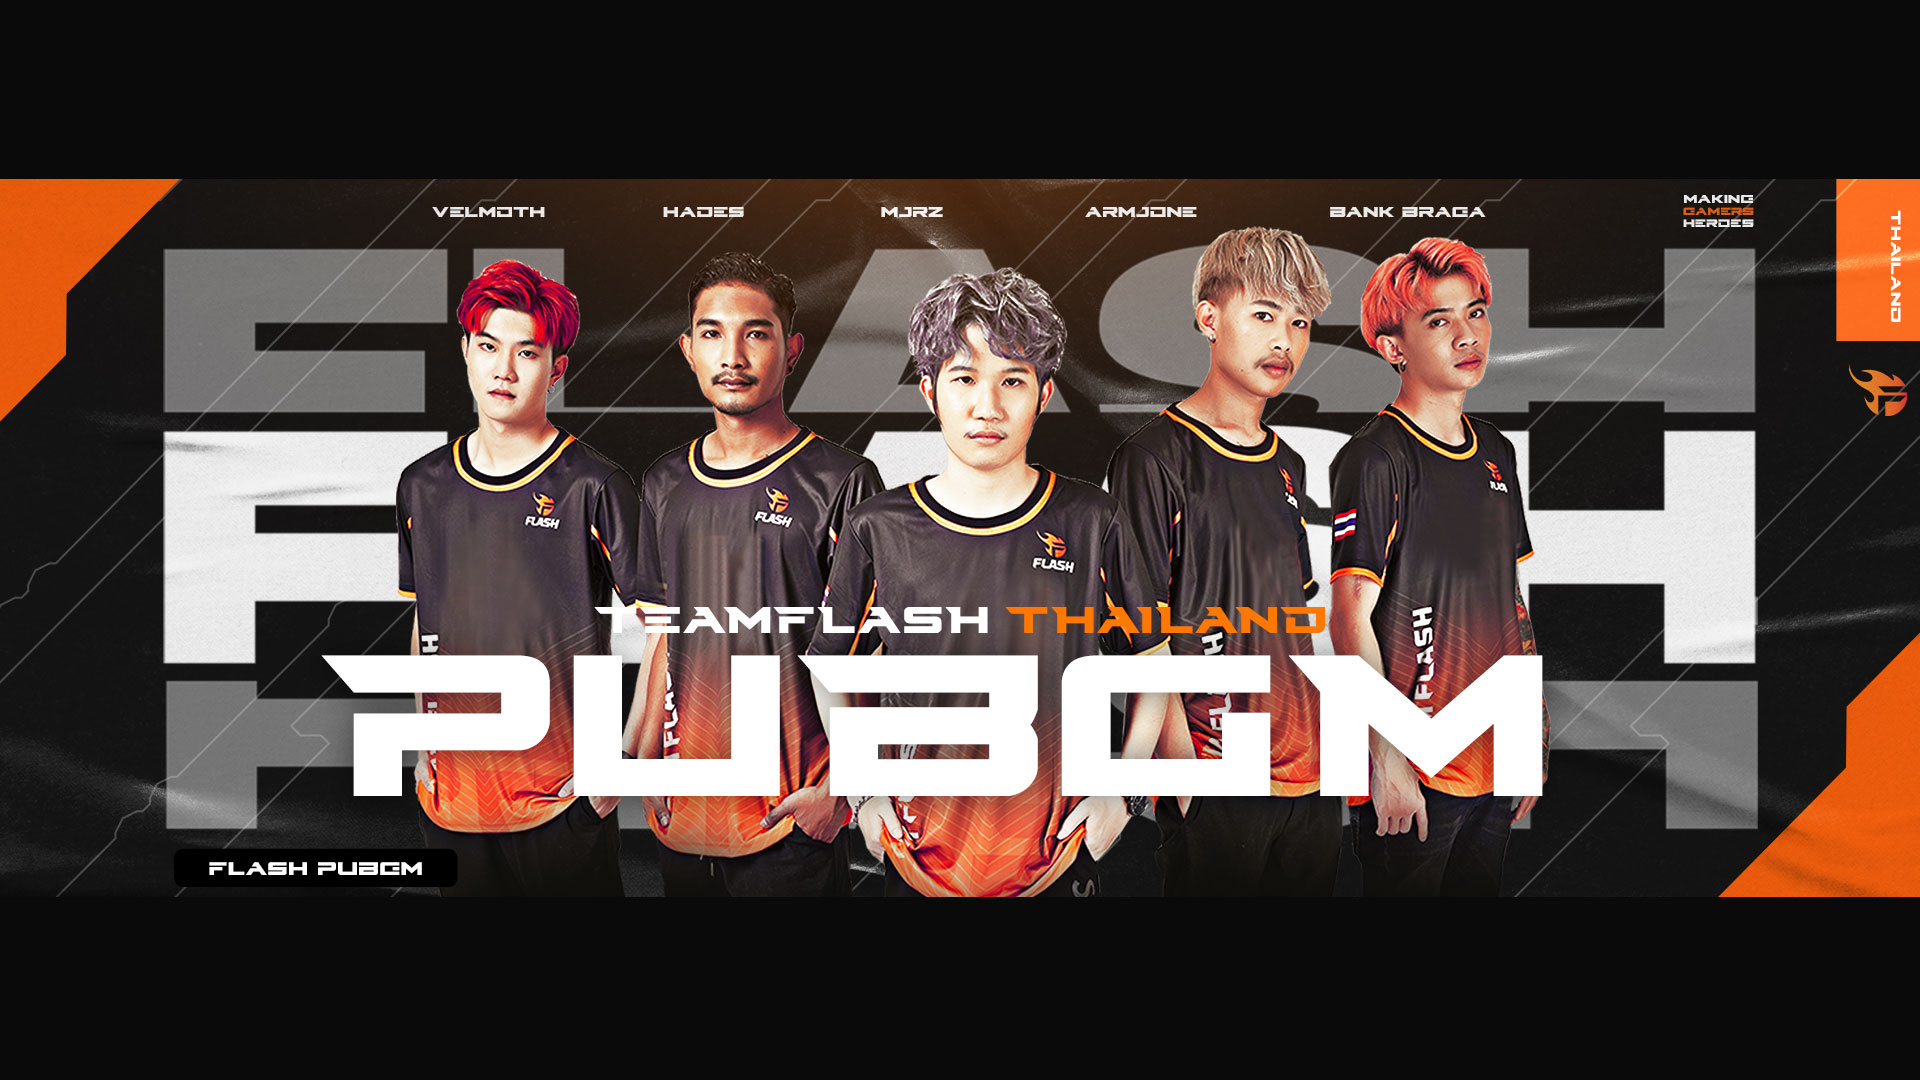 Team Flash Thailand 2322021 1